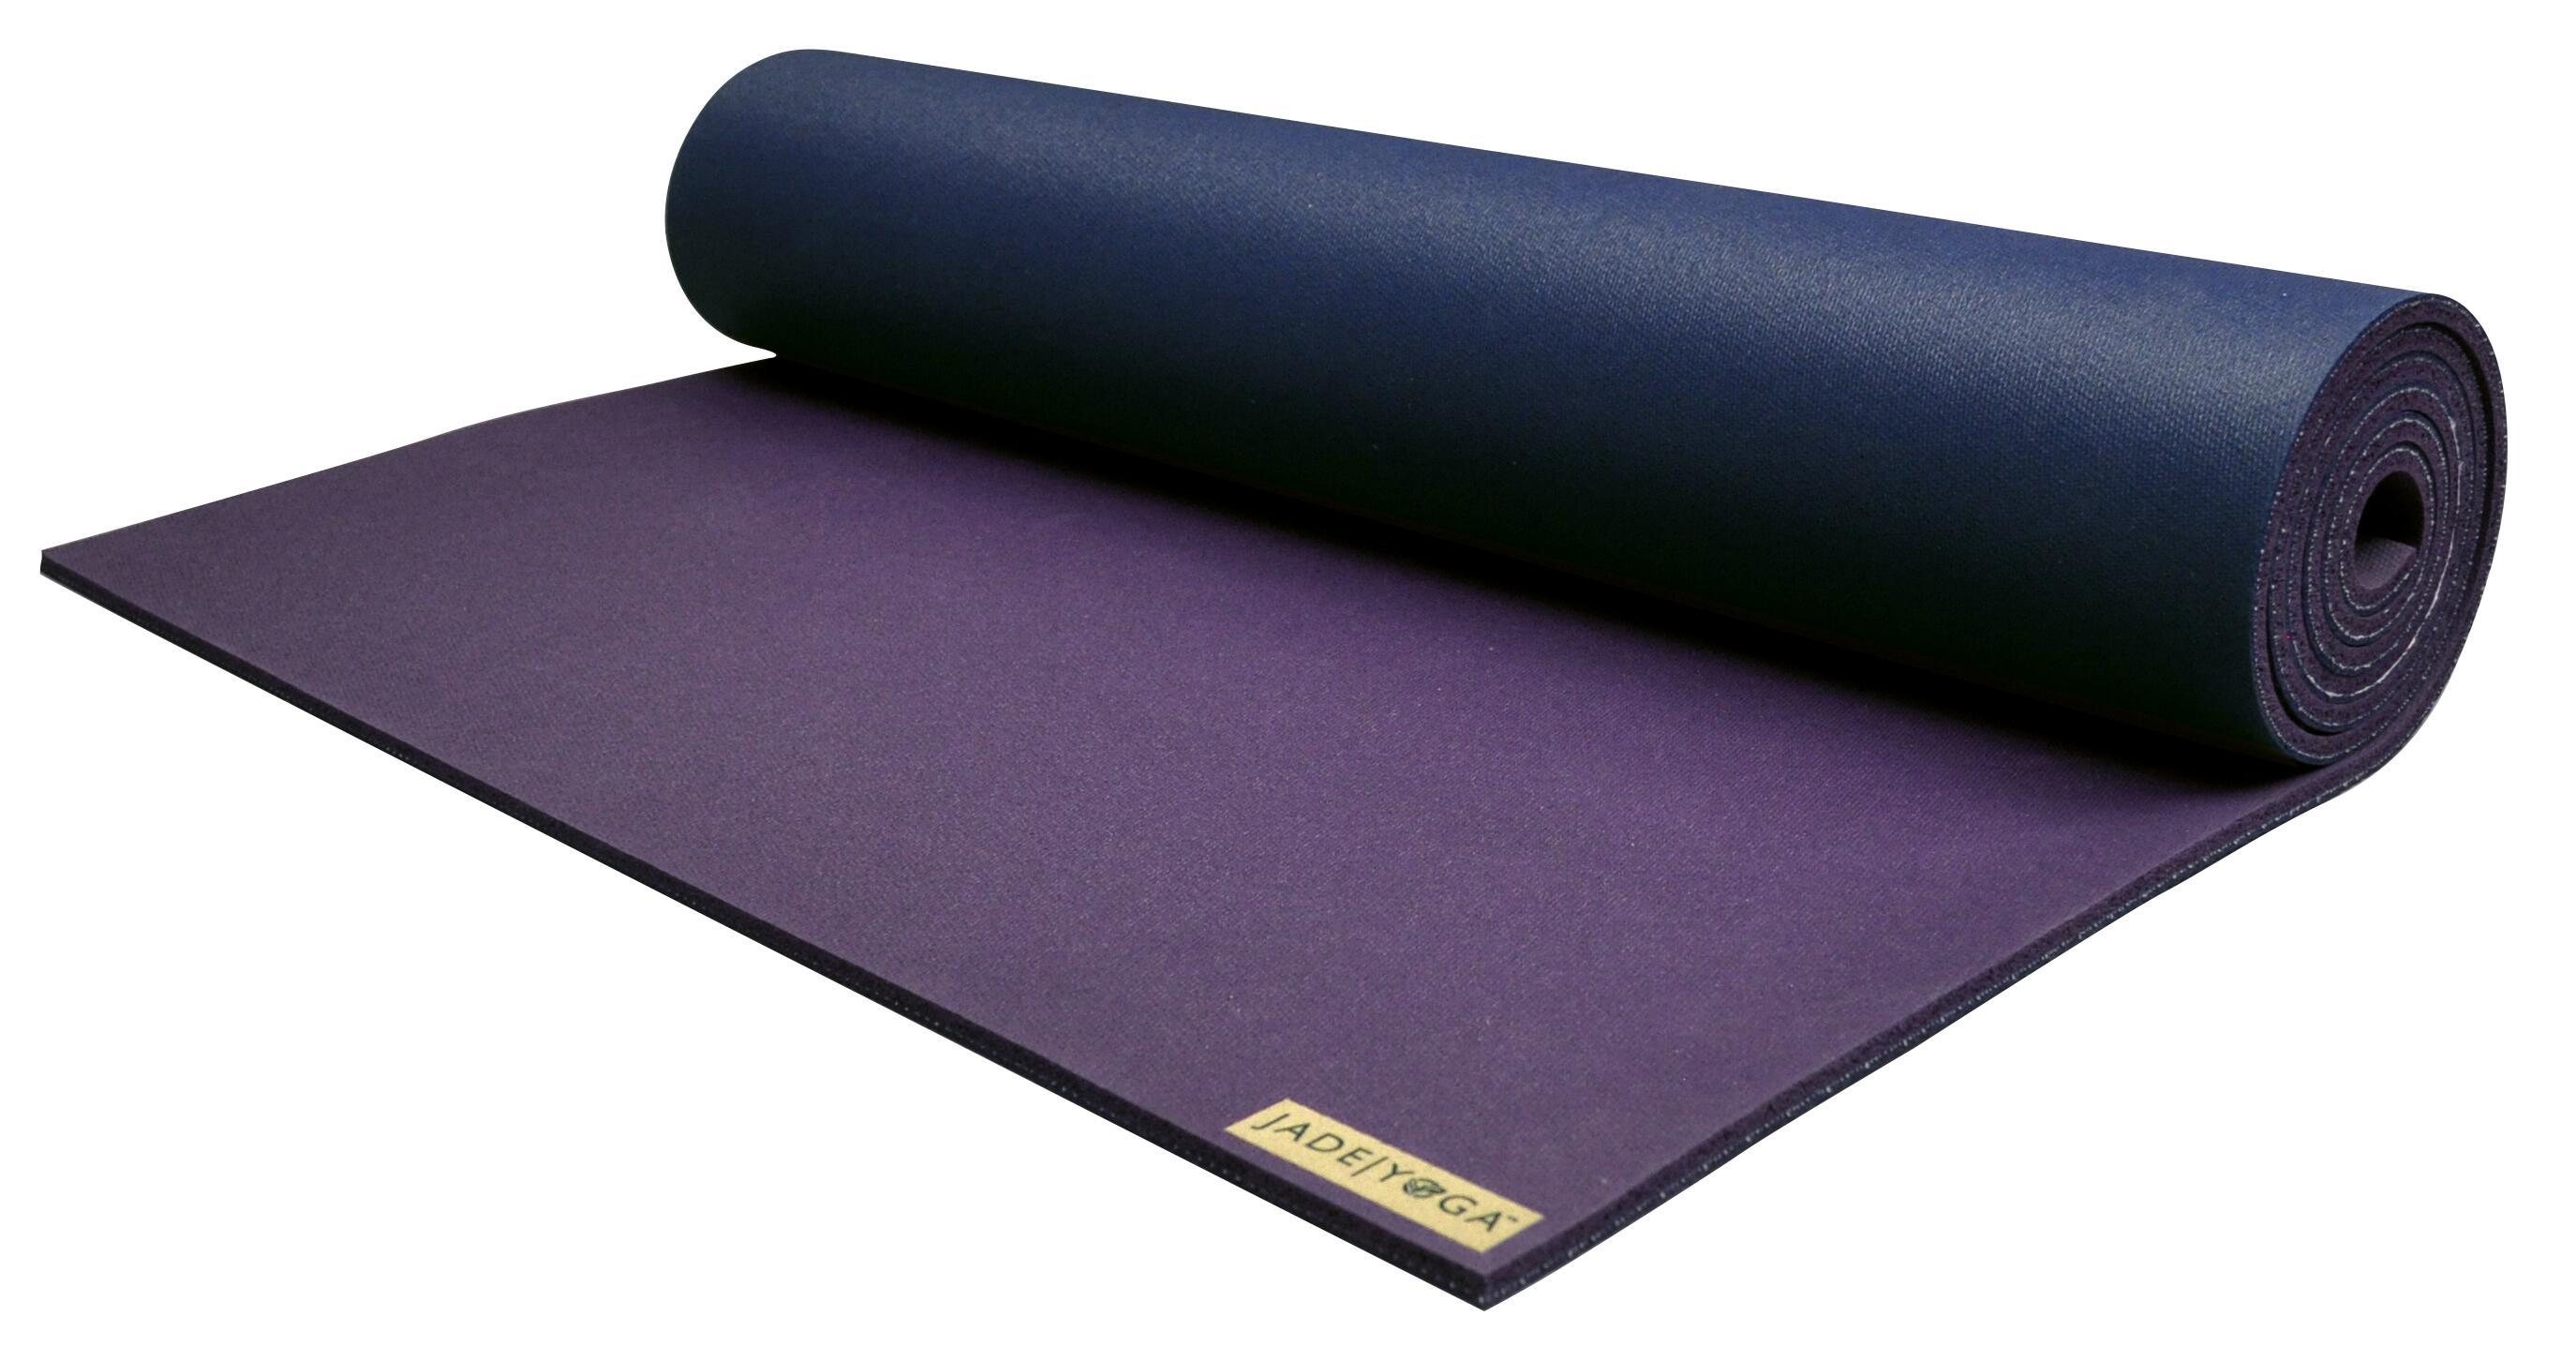 aarp, the girlfriend, jade yoga, yoga mat